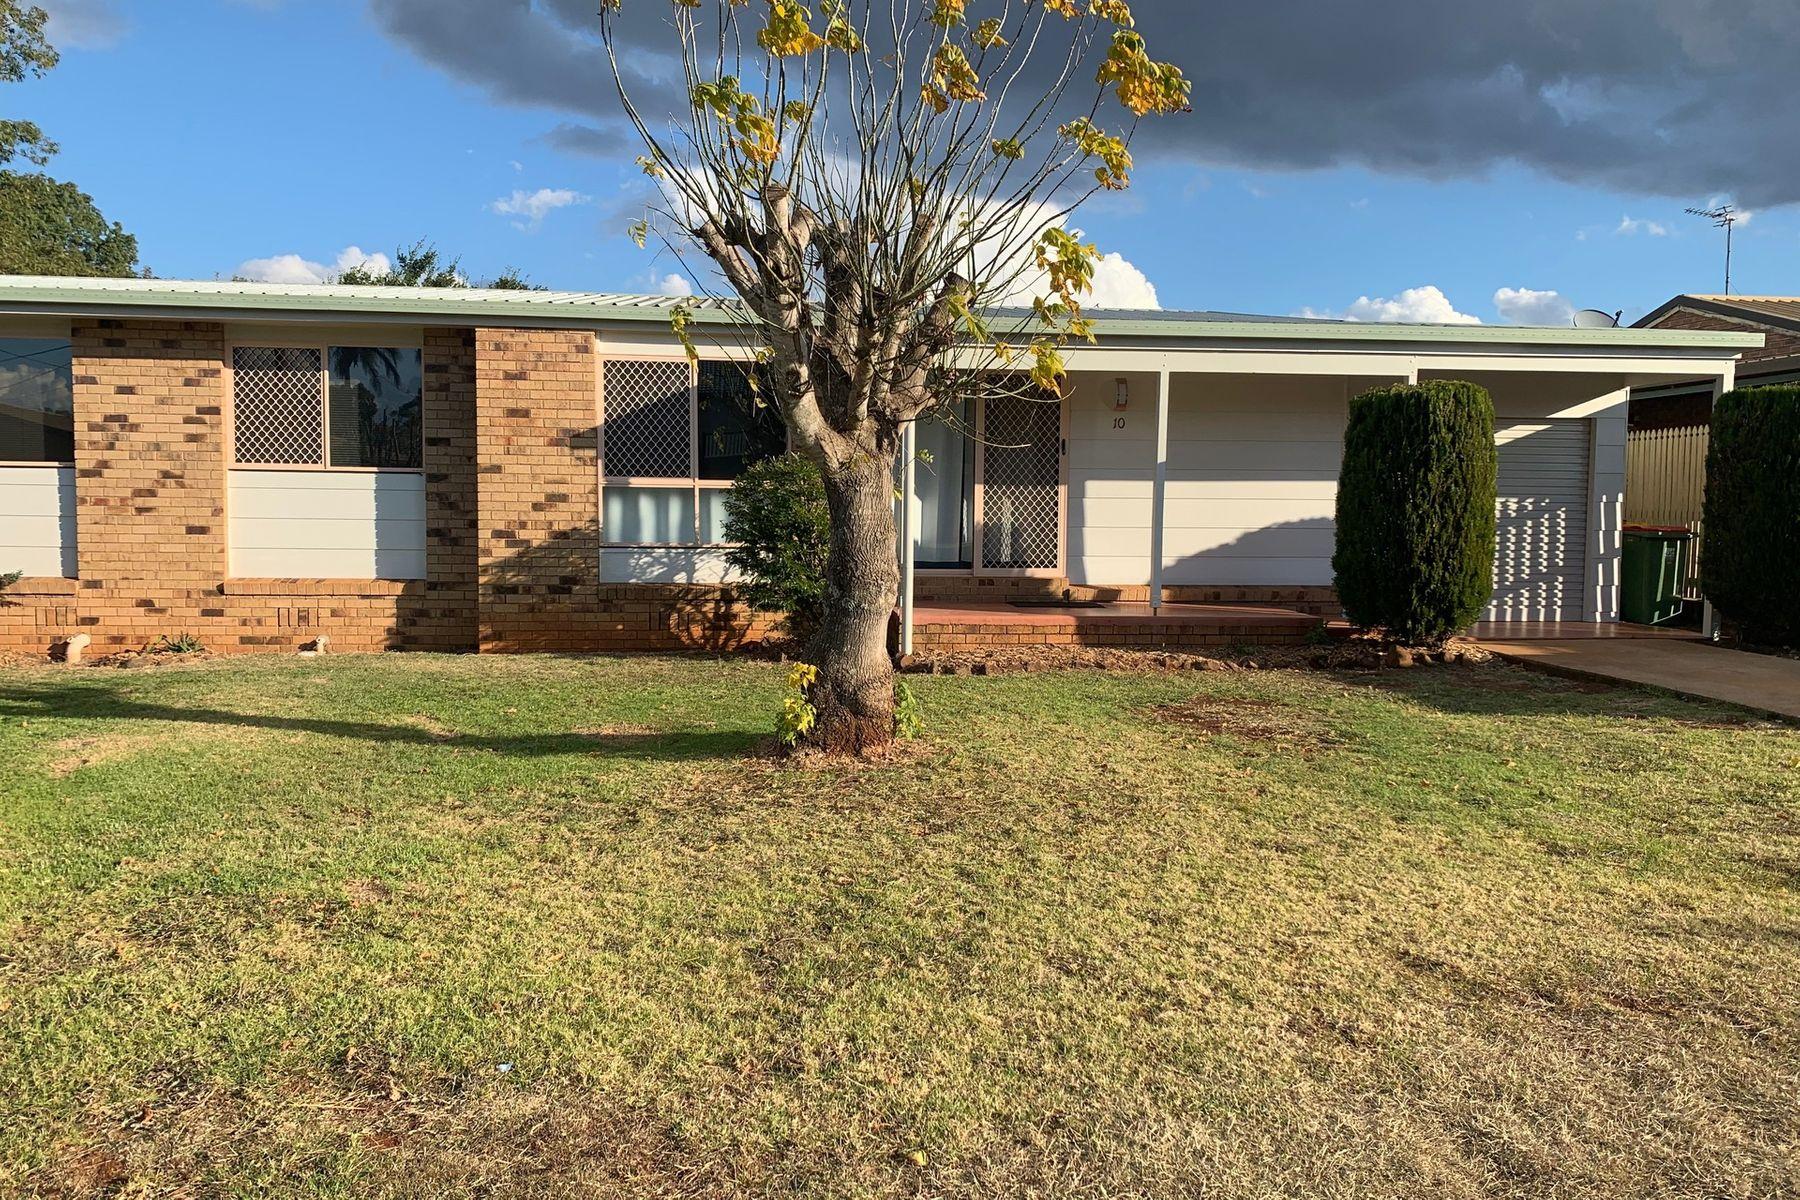 10 Edzill Street, Wilsonton Heights, QLD 4350